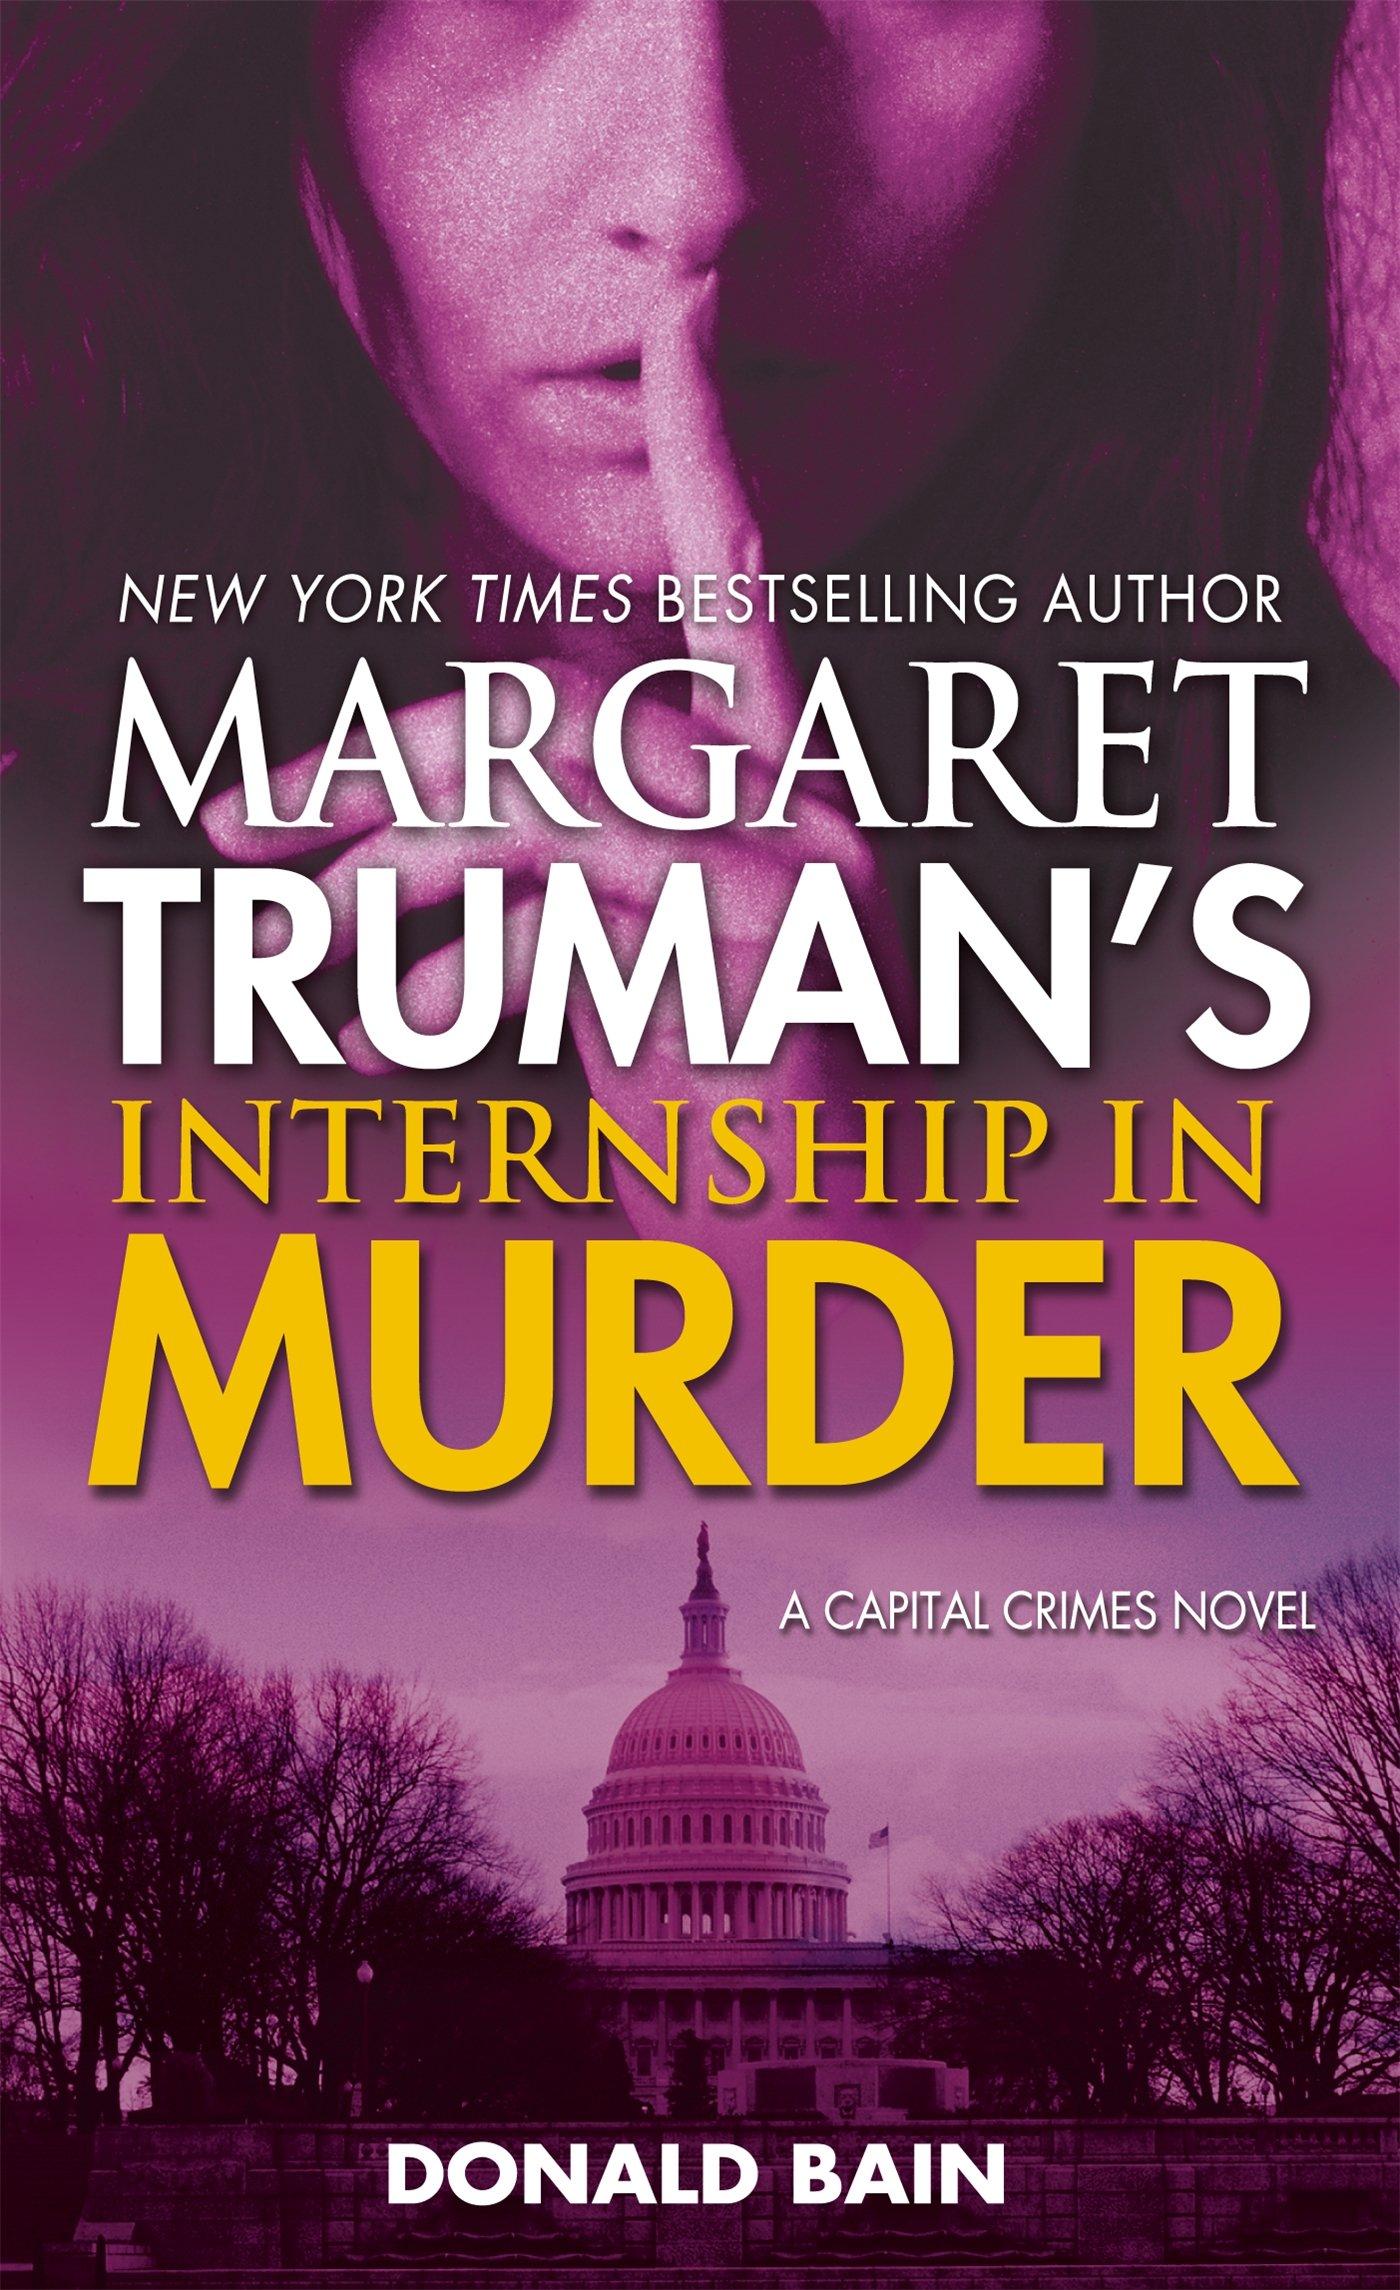 Margaret Trumans Internship Murder Capital product image